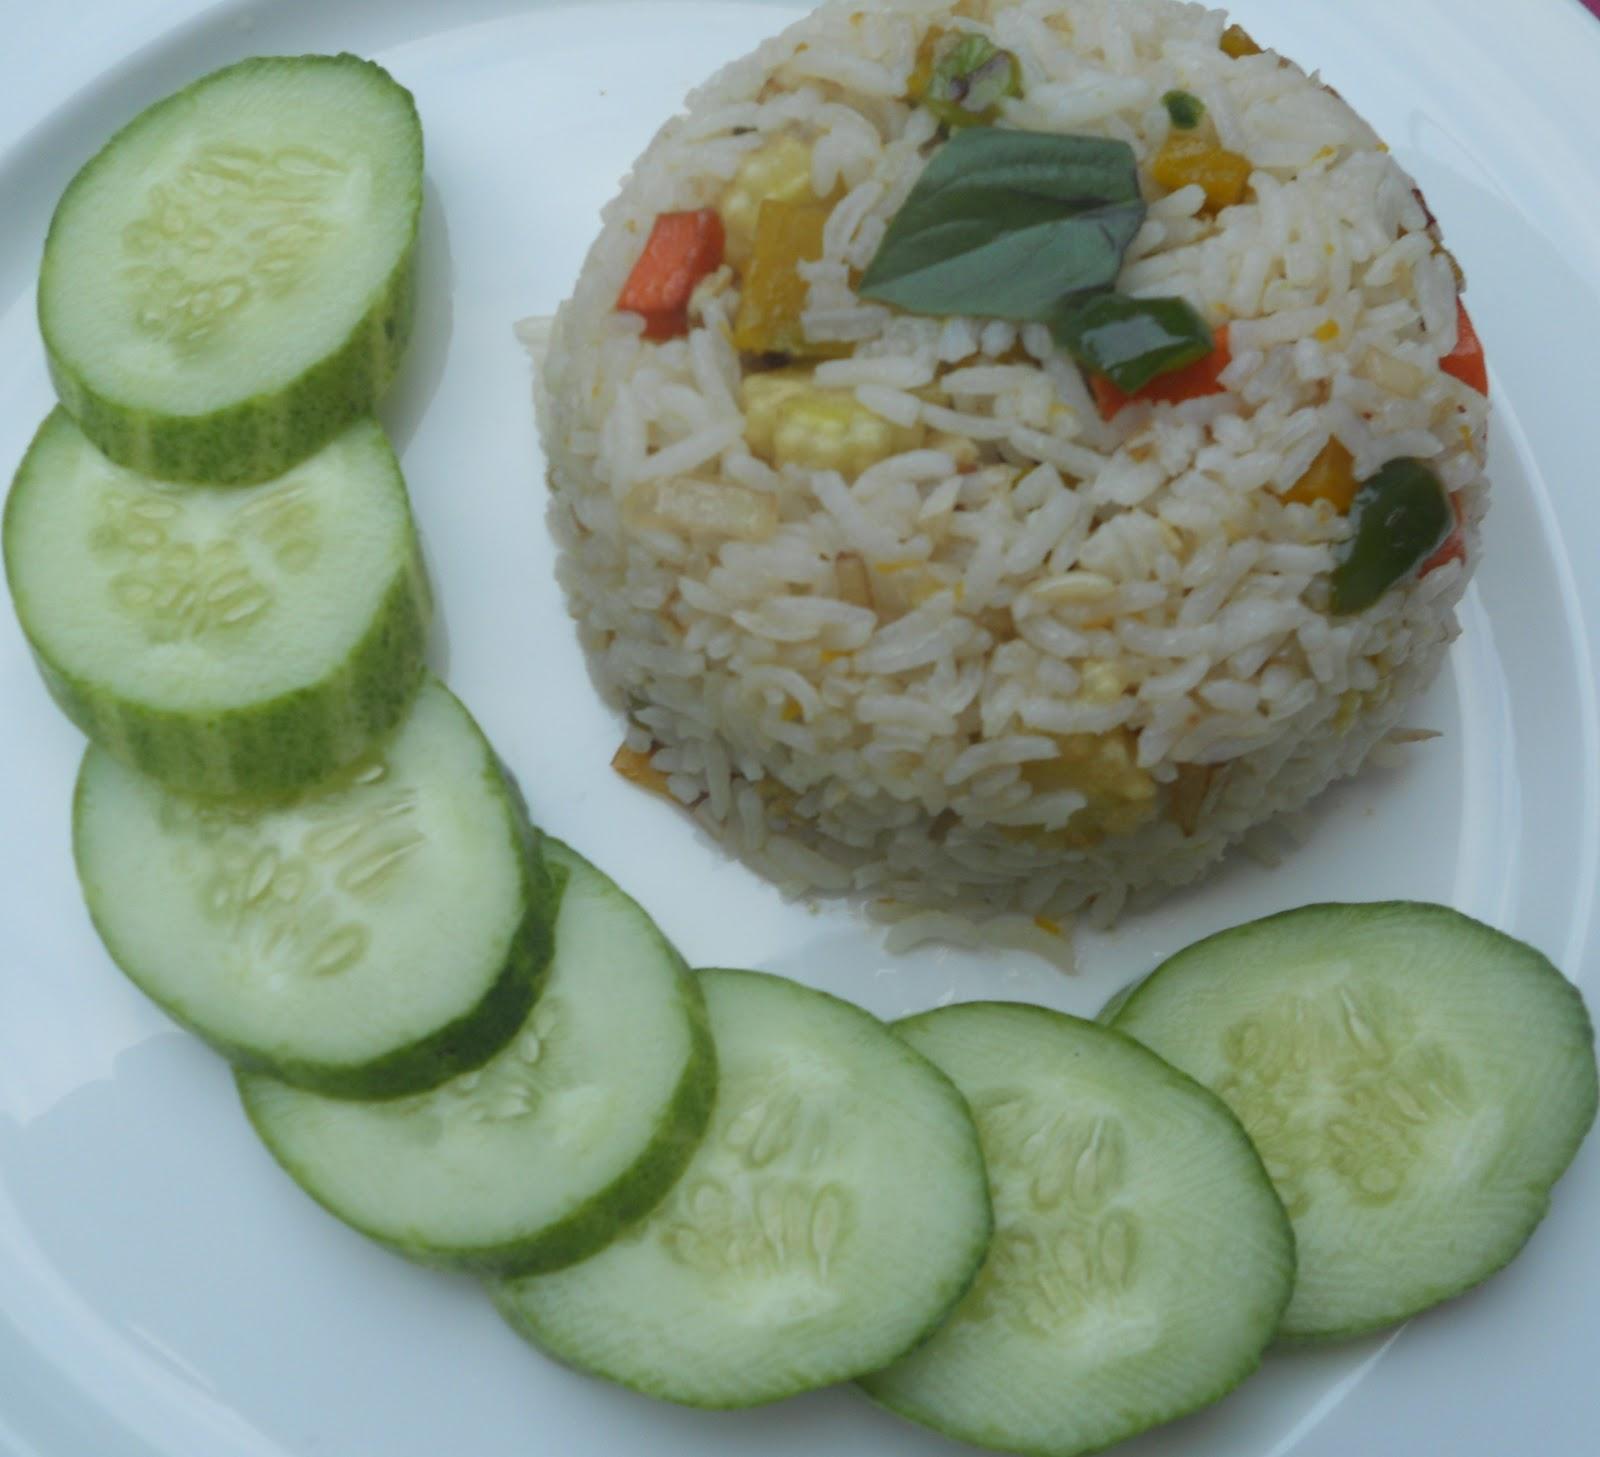 http://3.bp.blogspot.com/-e_imRxfhW58/UAmDk6U7rVI/AAAAAAAAA5k/iwHxU4VDyoc/s1600/thai+food+090.jpg